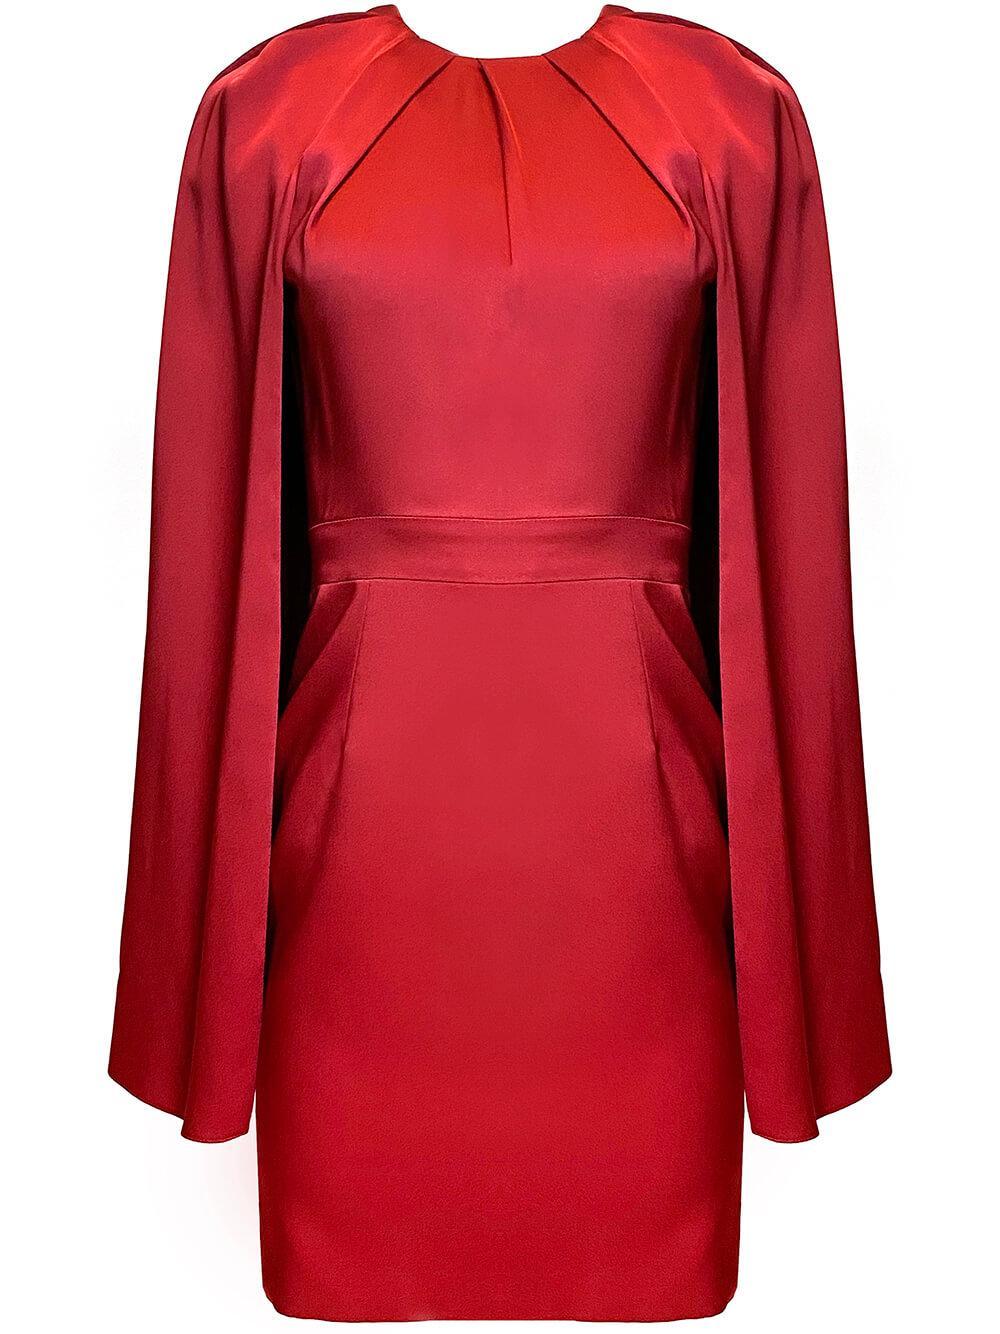 Mini Dress With Cape Item # 629351QBAAE